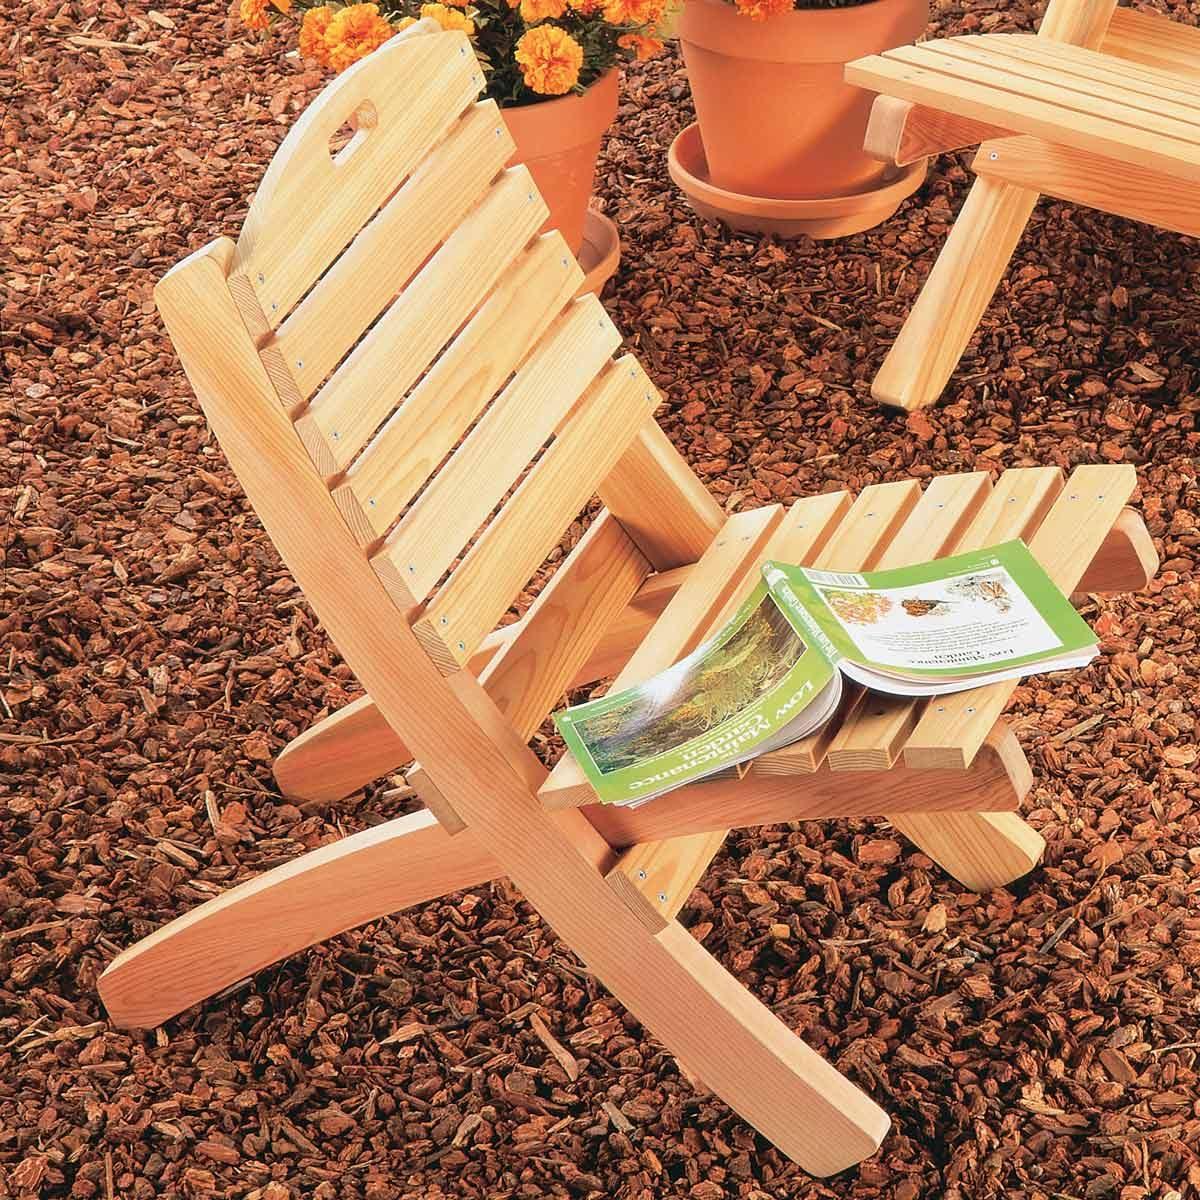 Build a Foldable Patio Chair